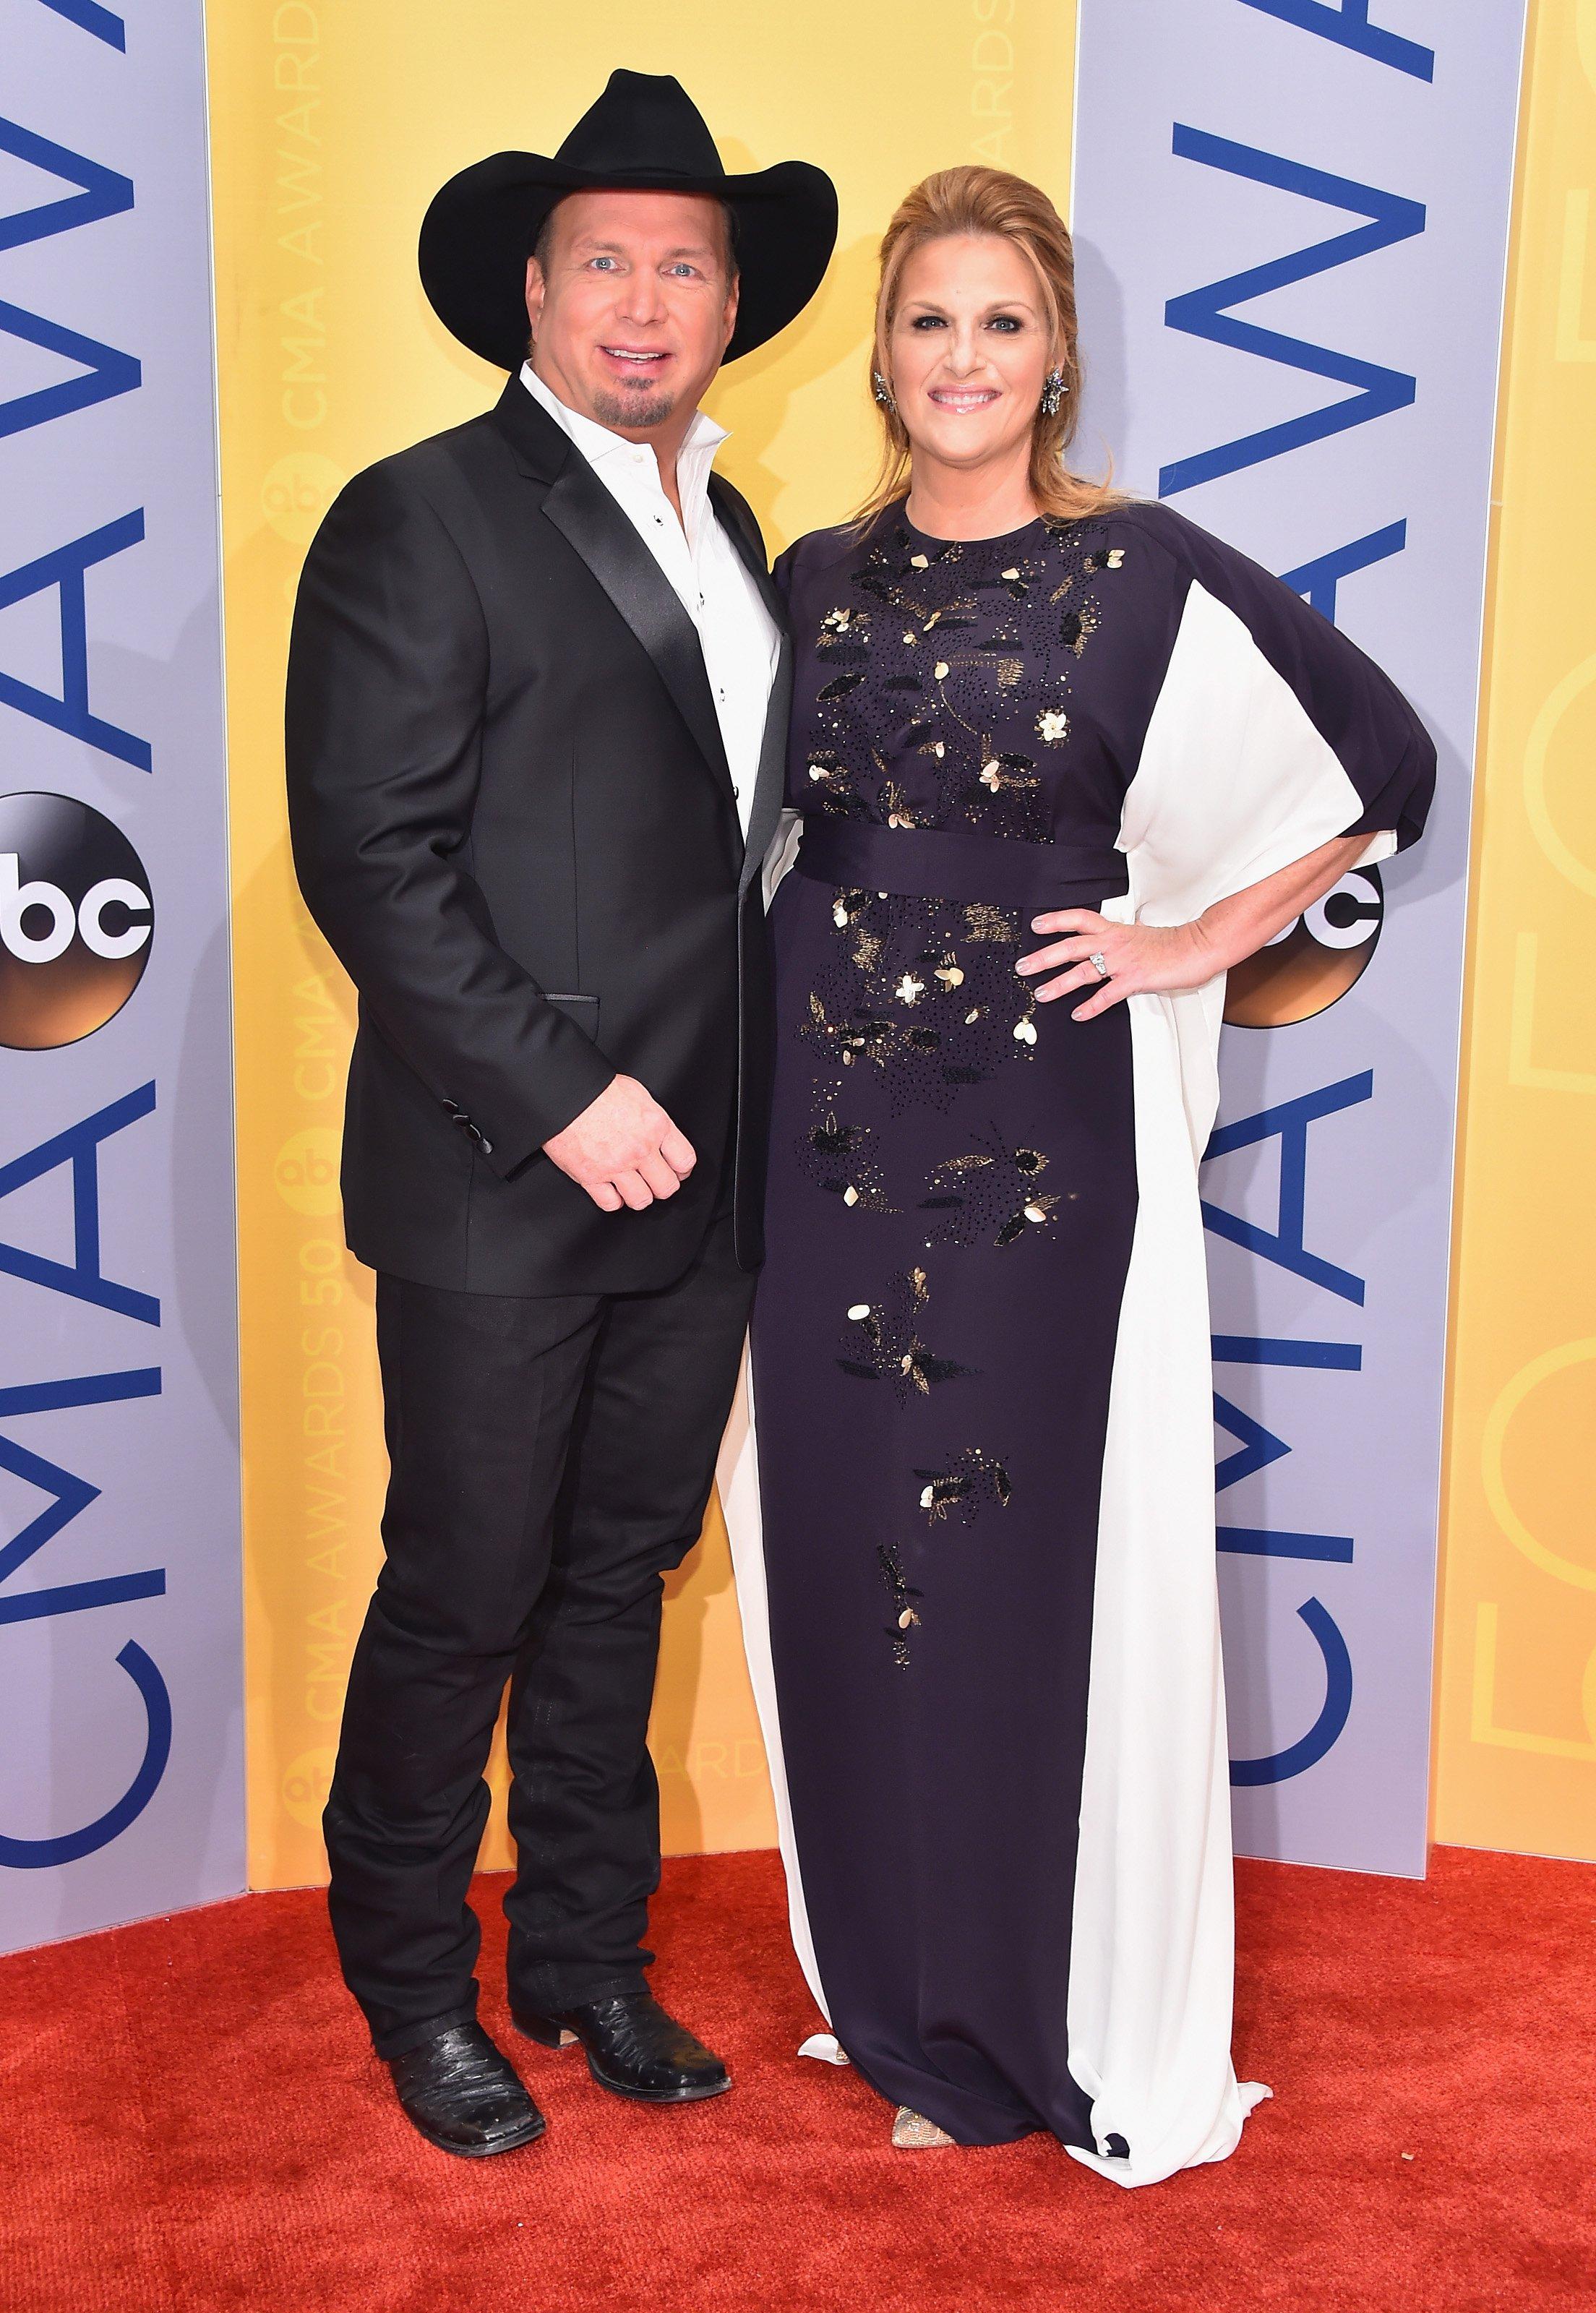 Garth Brooks and Trisha Yearwood attend the 50th annual CMA Awards at the Bridgestone Arena on November 2, 2016 in Nashville